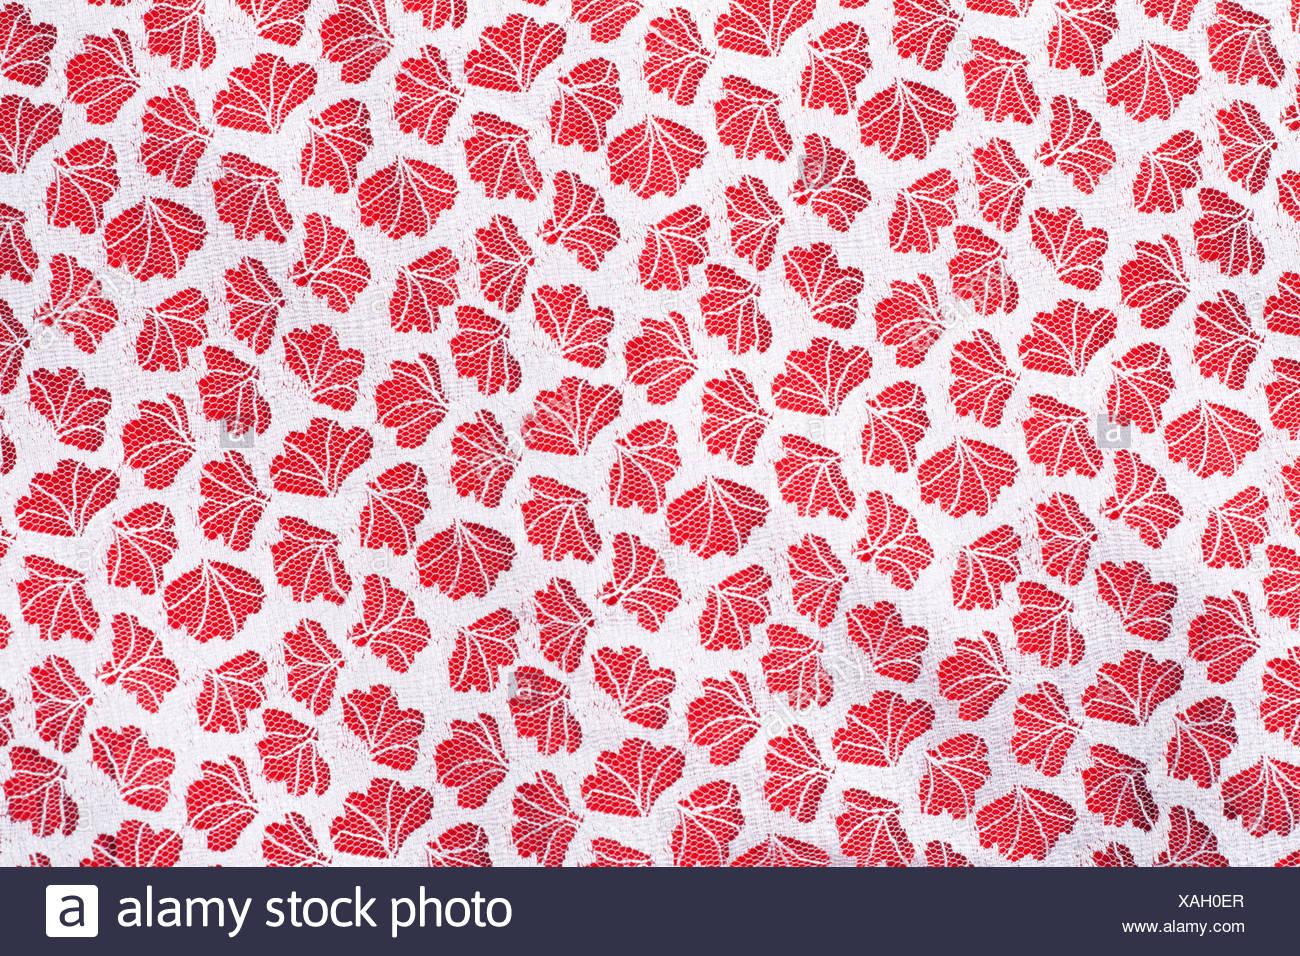 Tulle fabrics on red, background Stock Photo